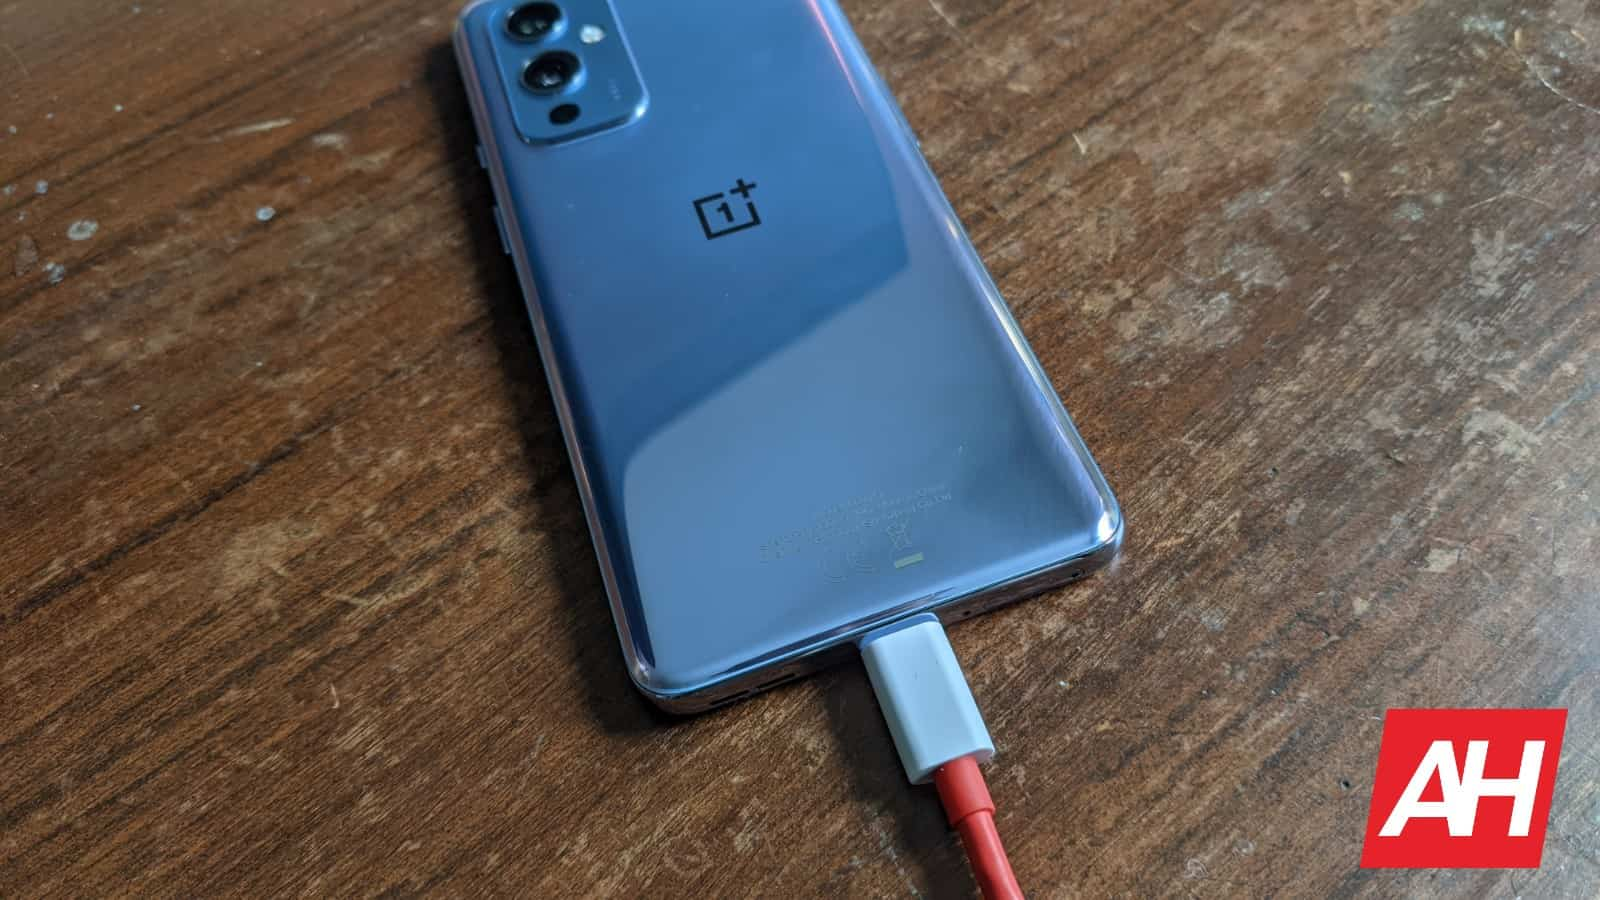 AH OnePlus 9 KL image charging 3